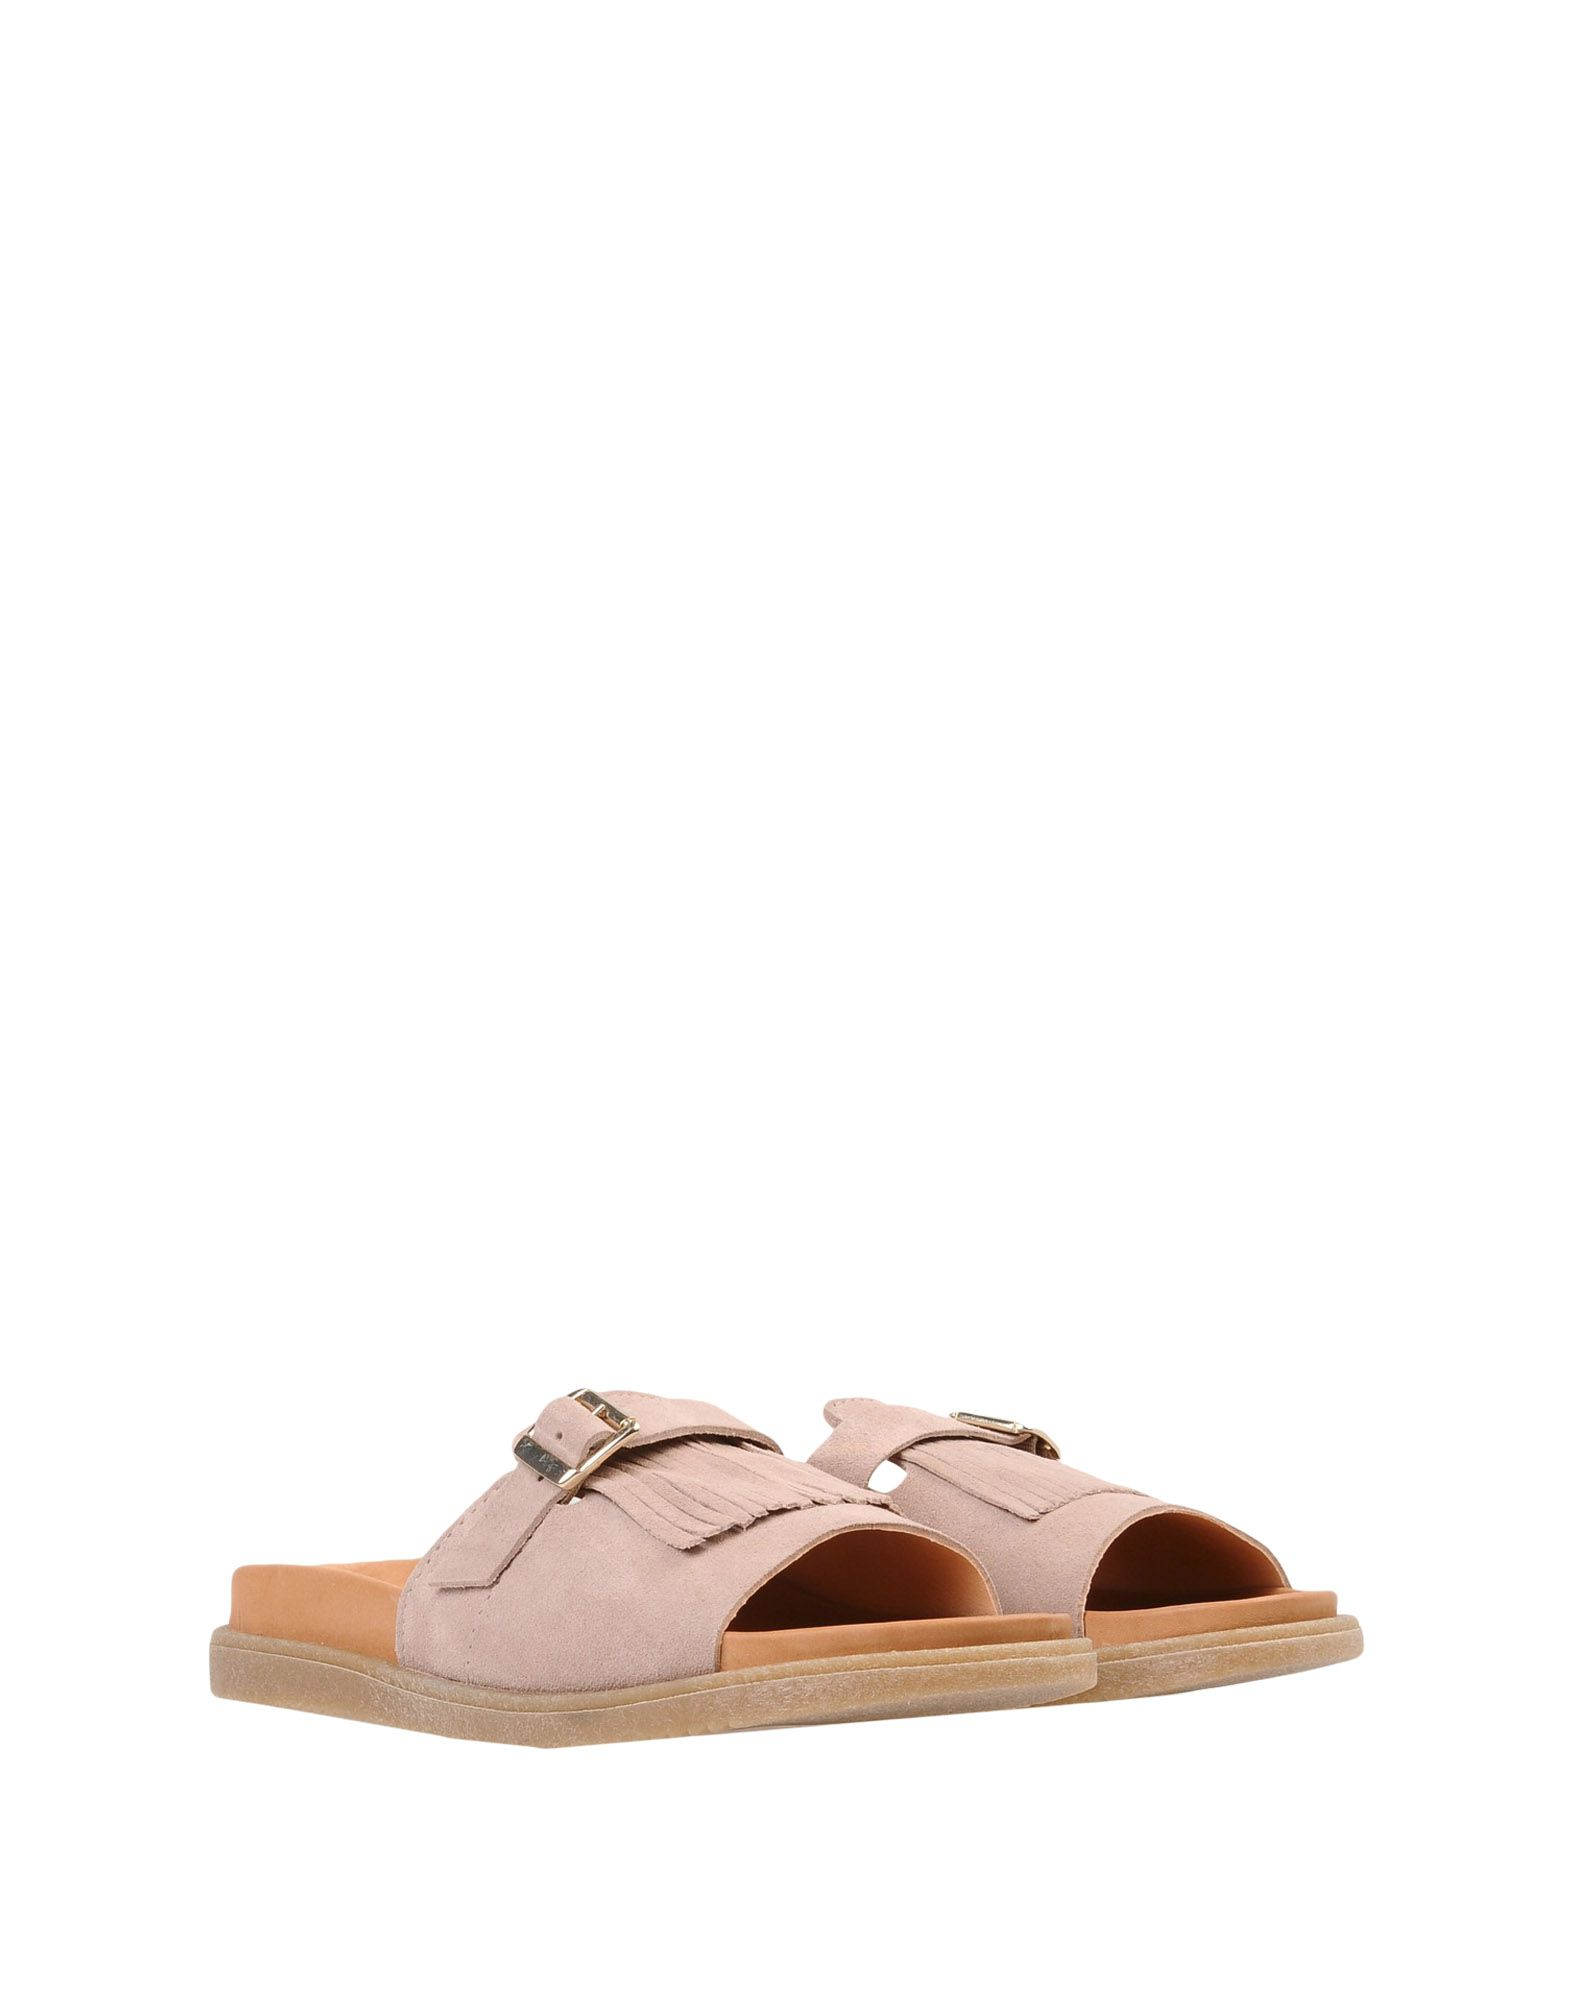 8 Sandalen Damen  11466665QU Gute Qualität Qualität Qualität beliebte Schuhe ff5dc2